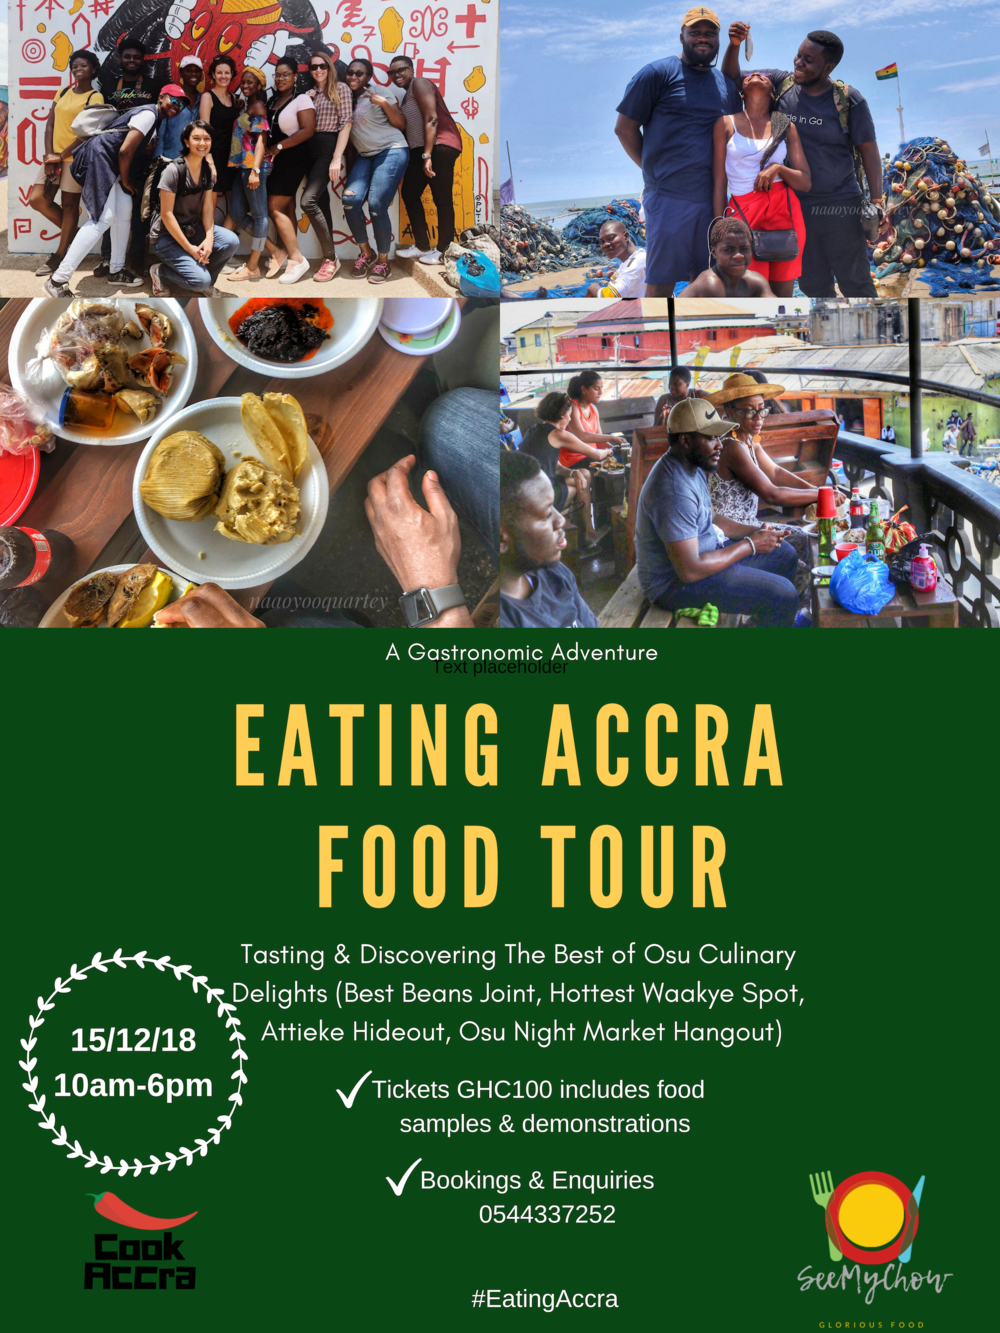 eating accra food crawl-2.png